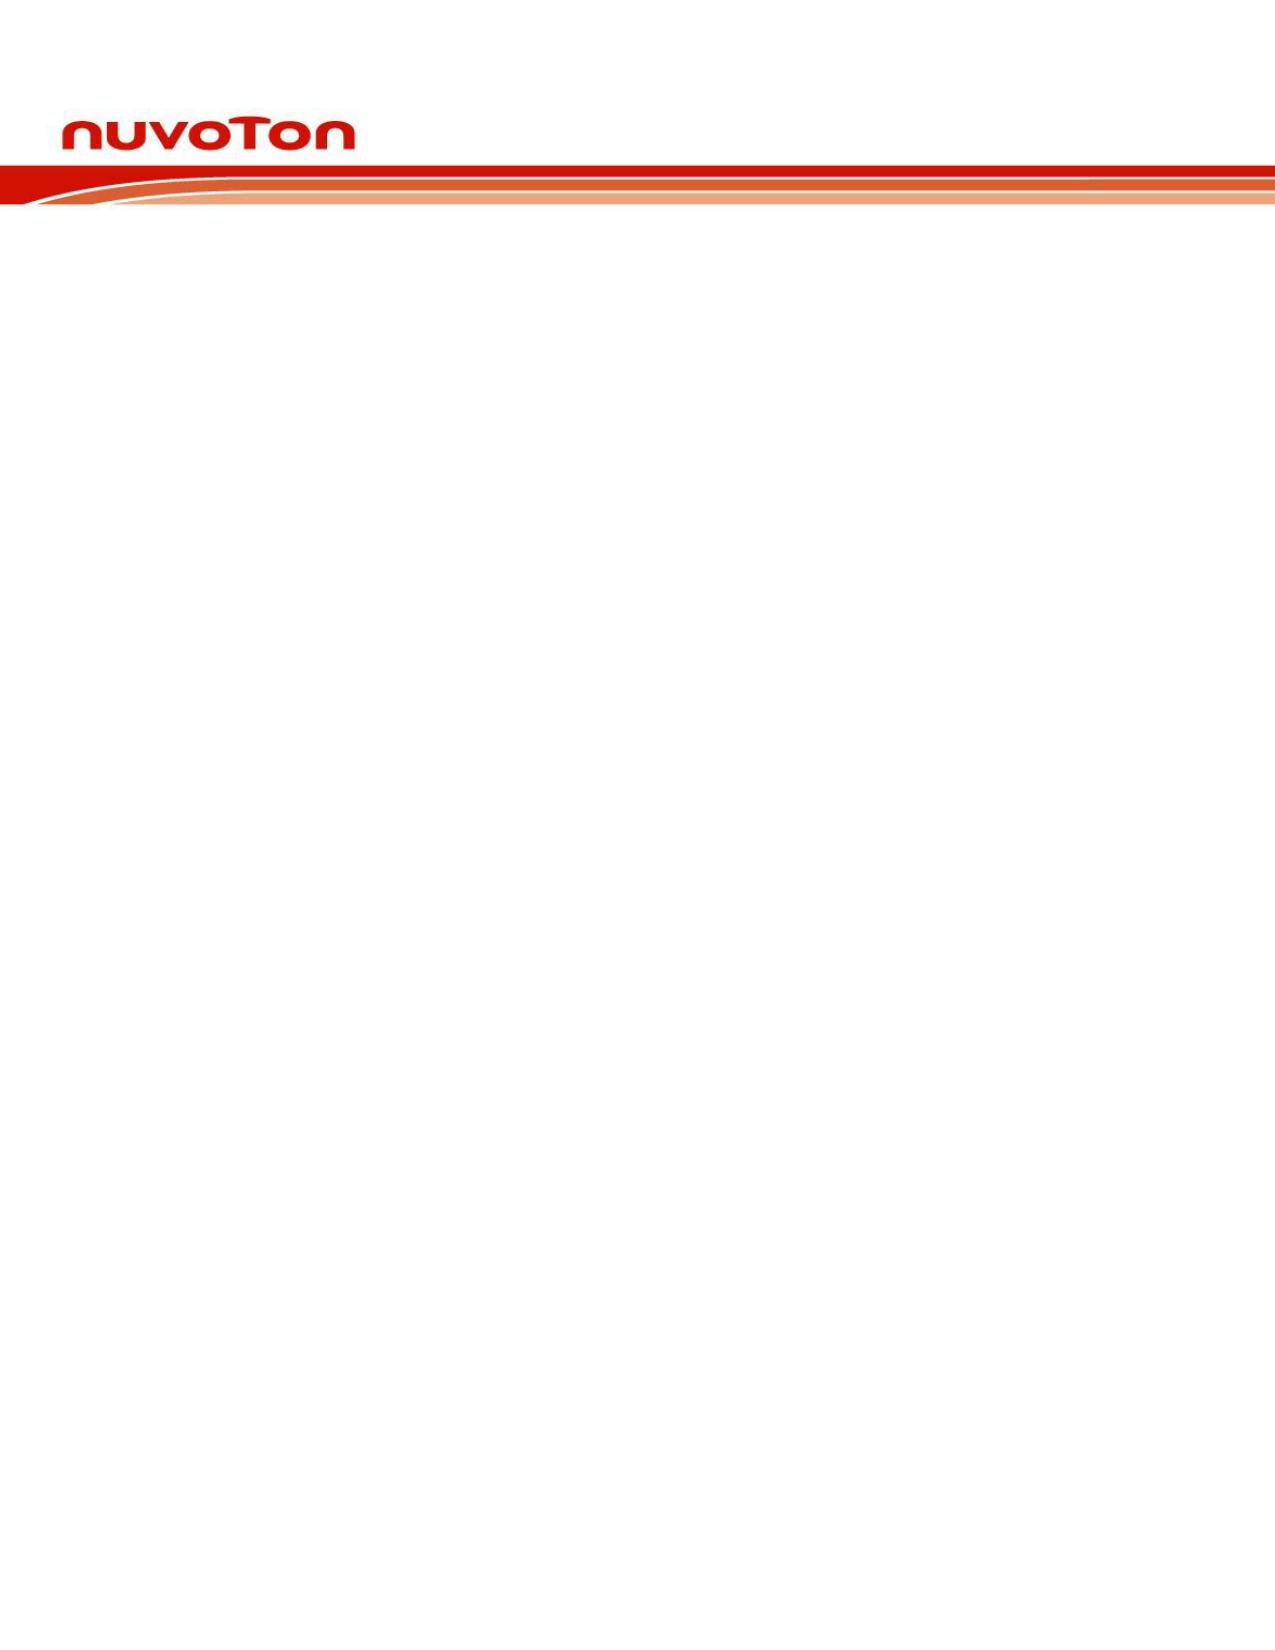 M054ZBN دیتاشیت PDF